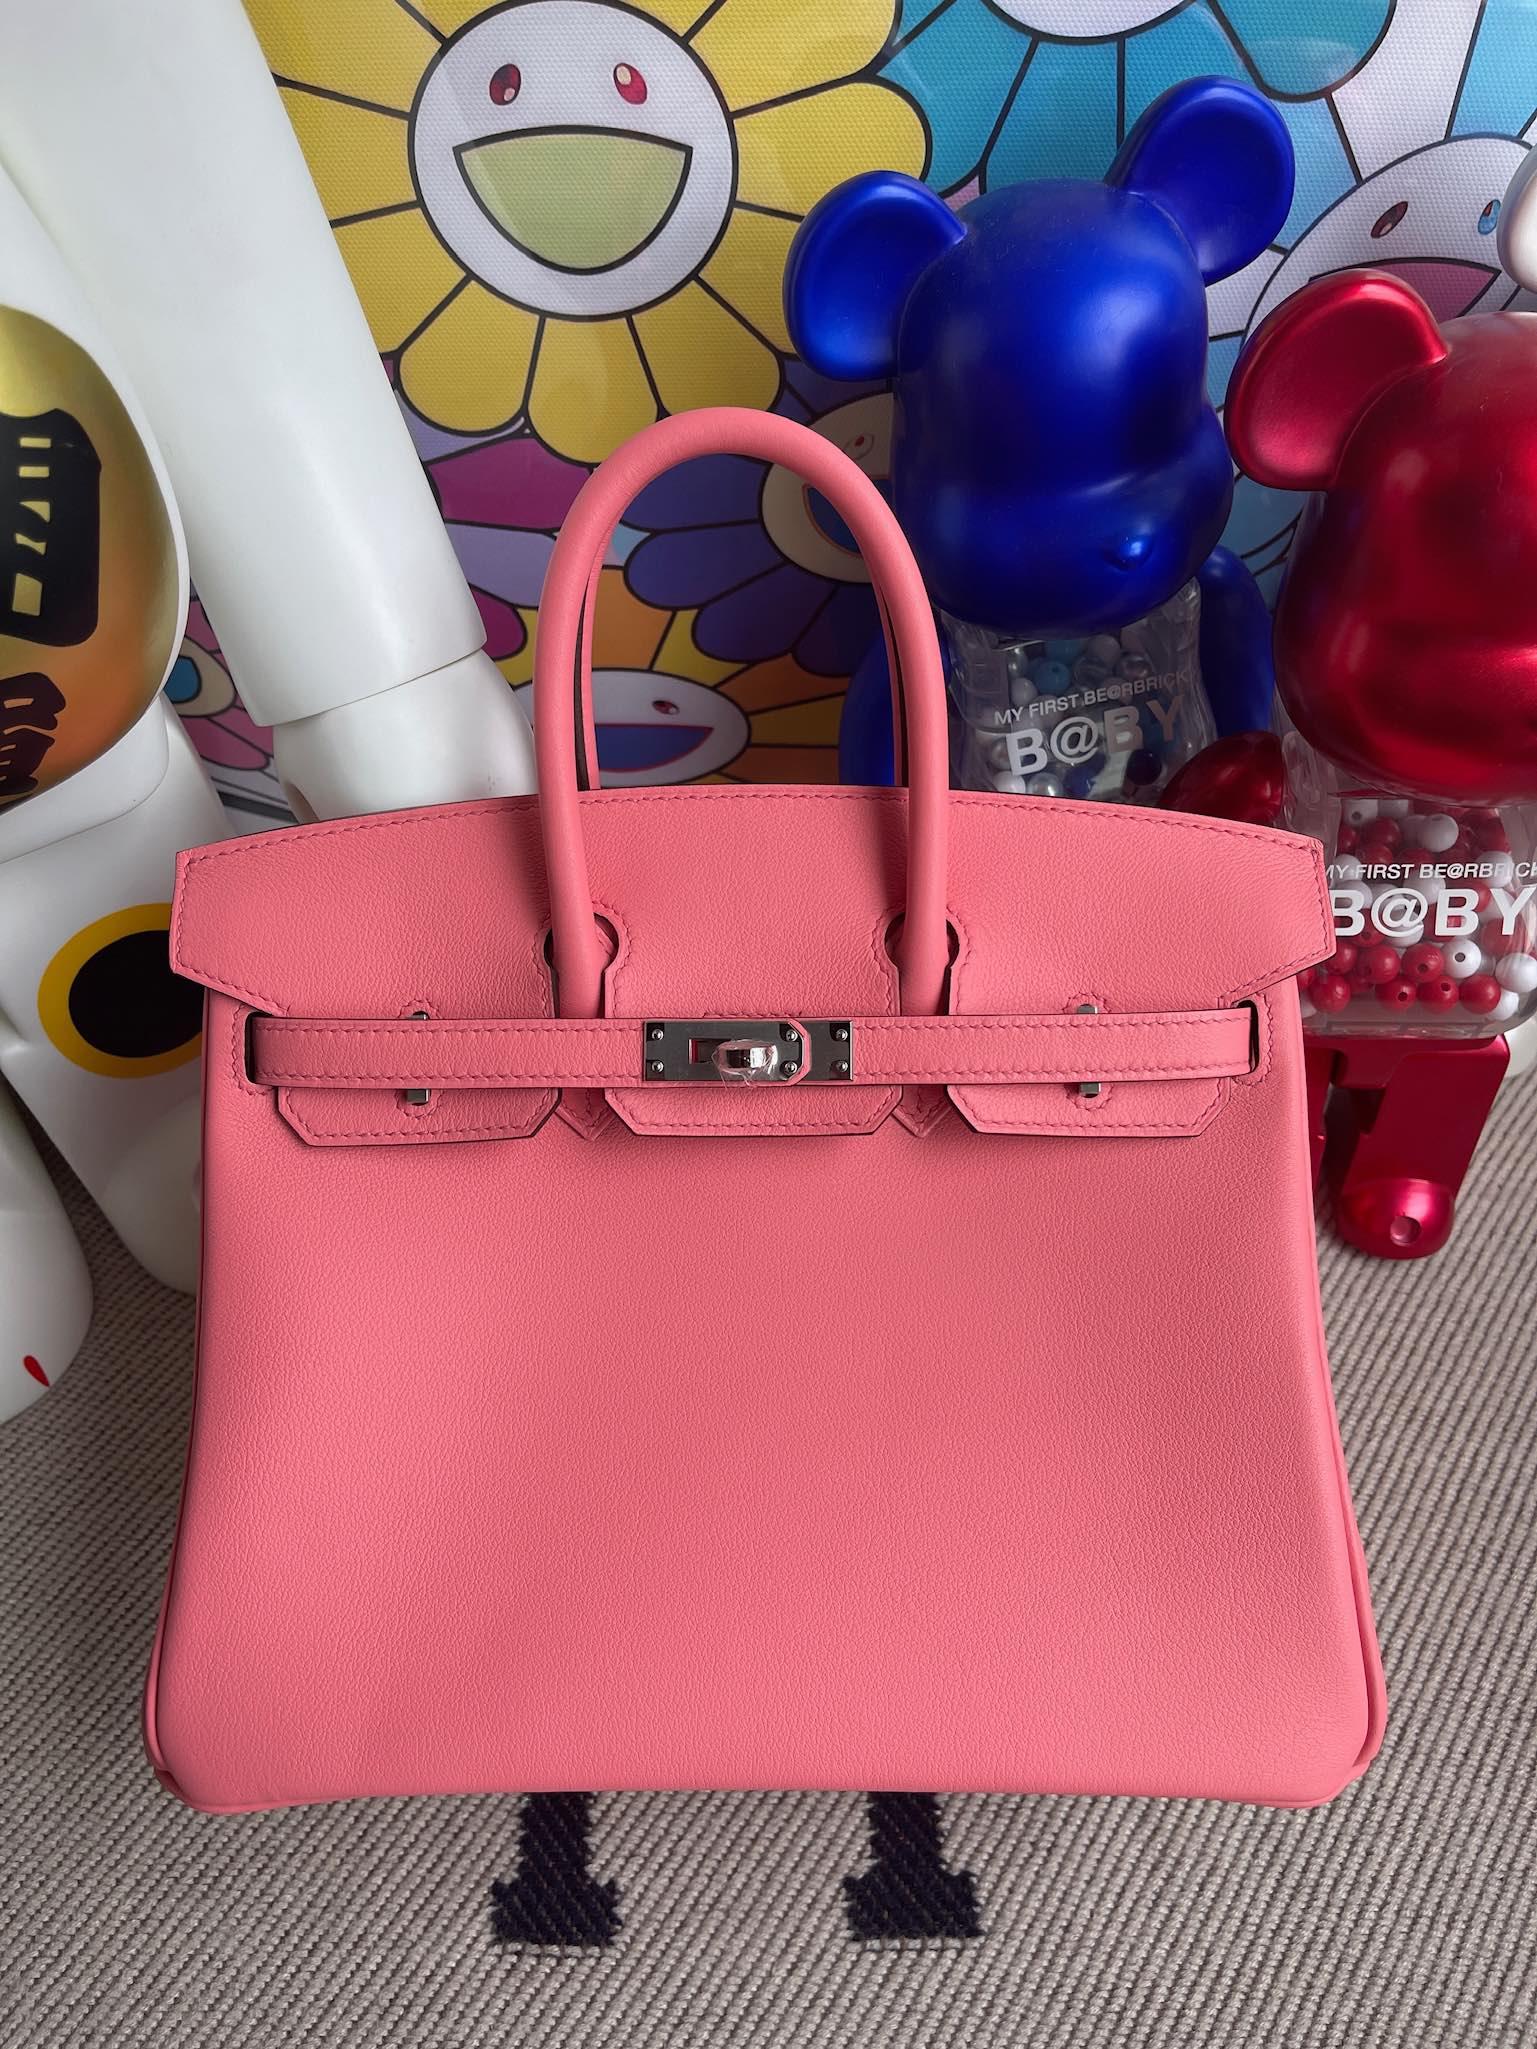 Hermès(爱马仕)Birkin 铂金包 Swift 夏日玫瑰粉 银扣 25cm 顶级手缝